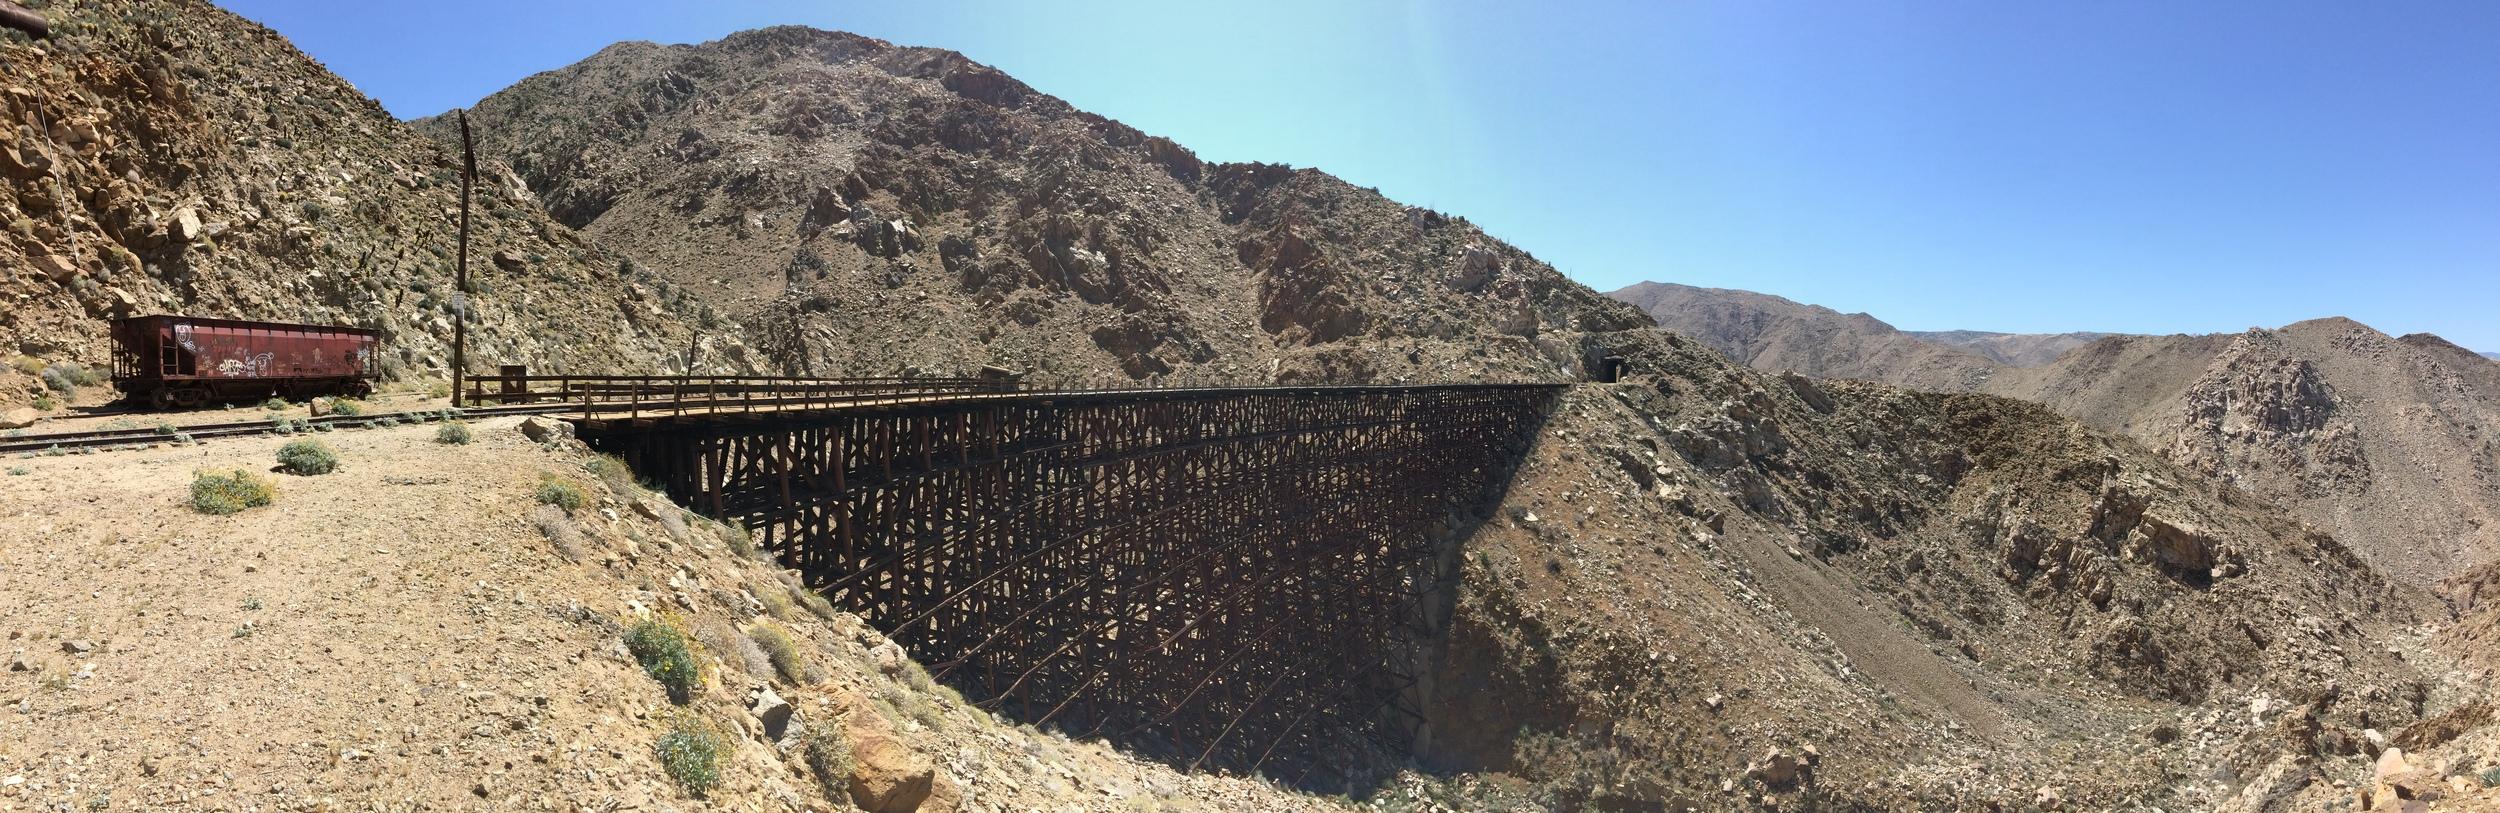 Goat Canyon Trestle, facing East, April 2015